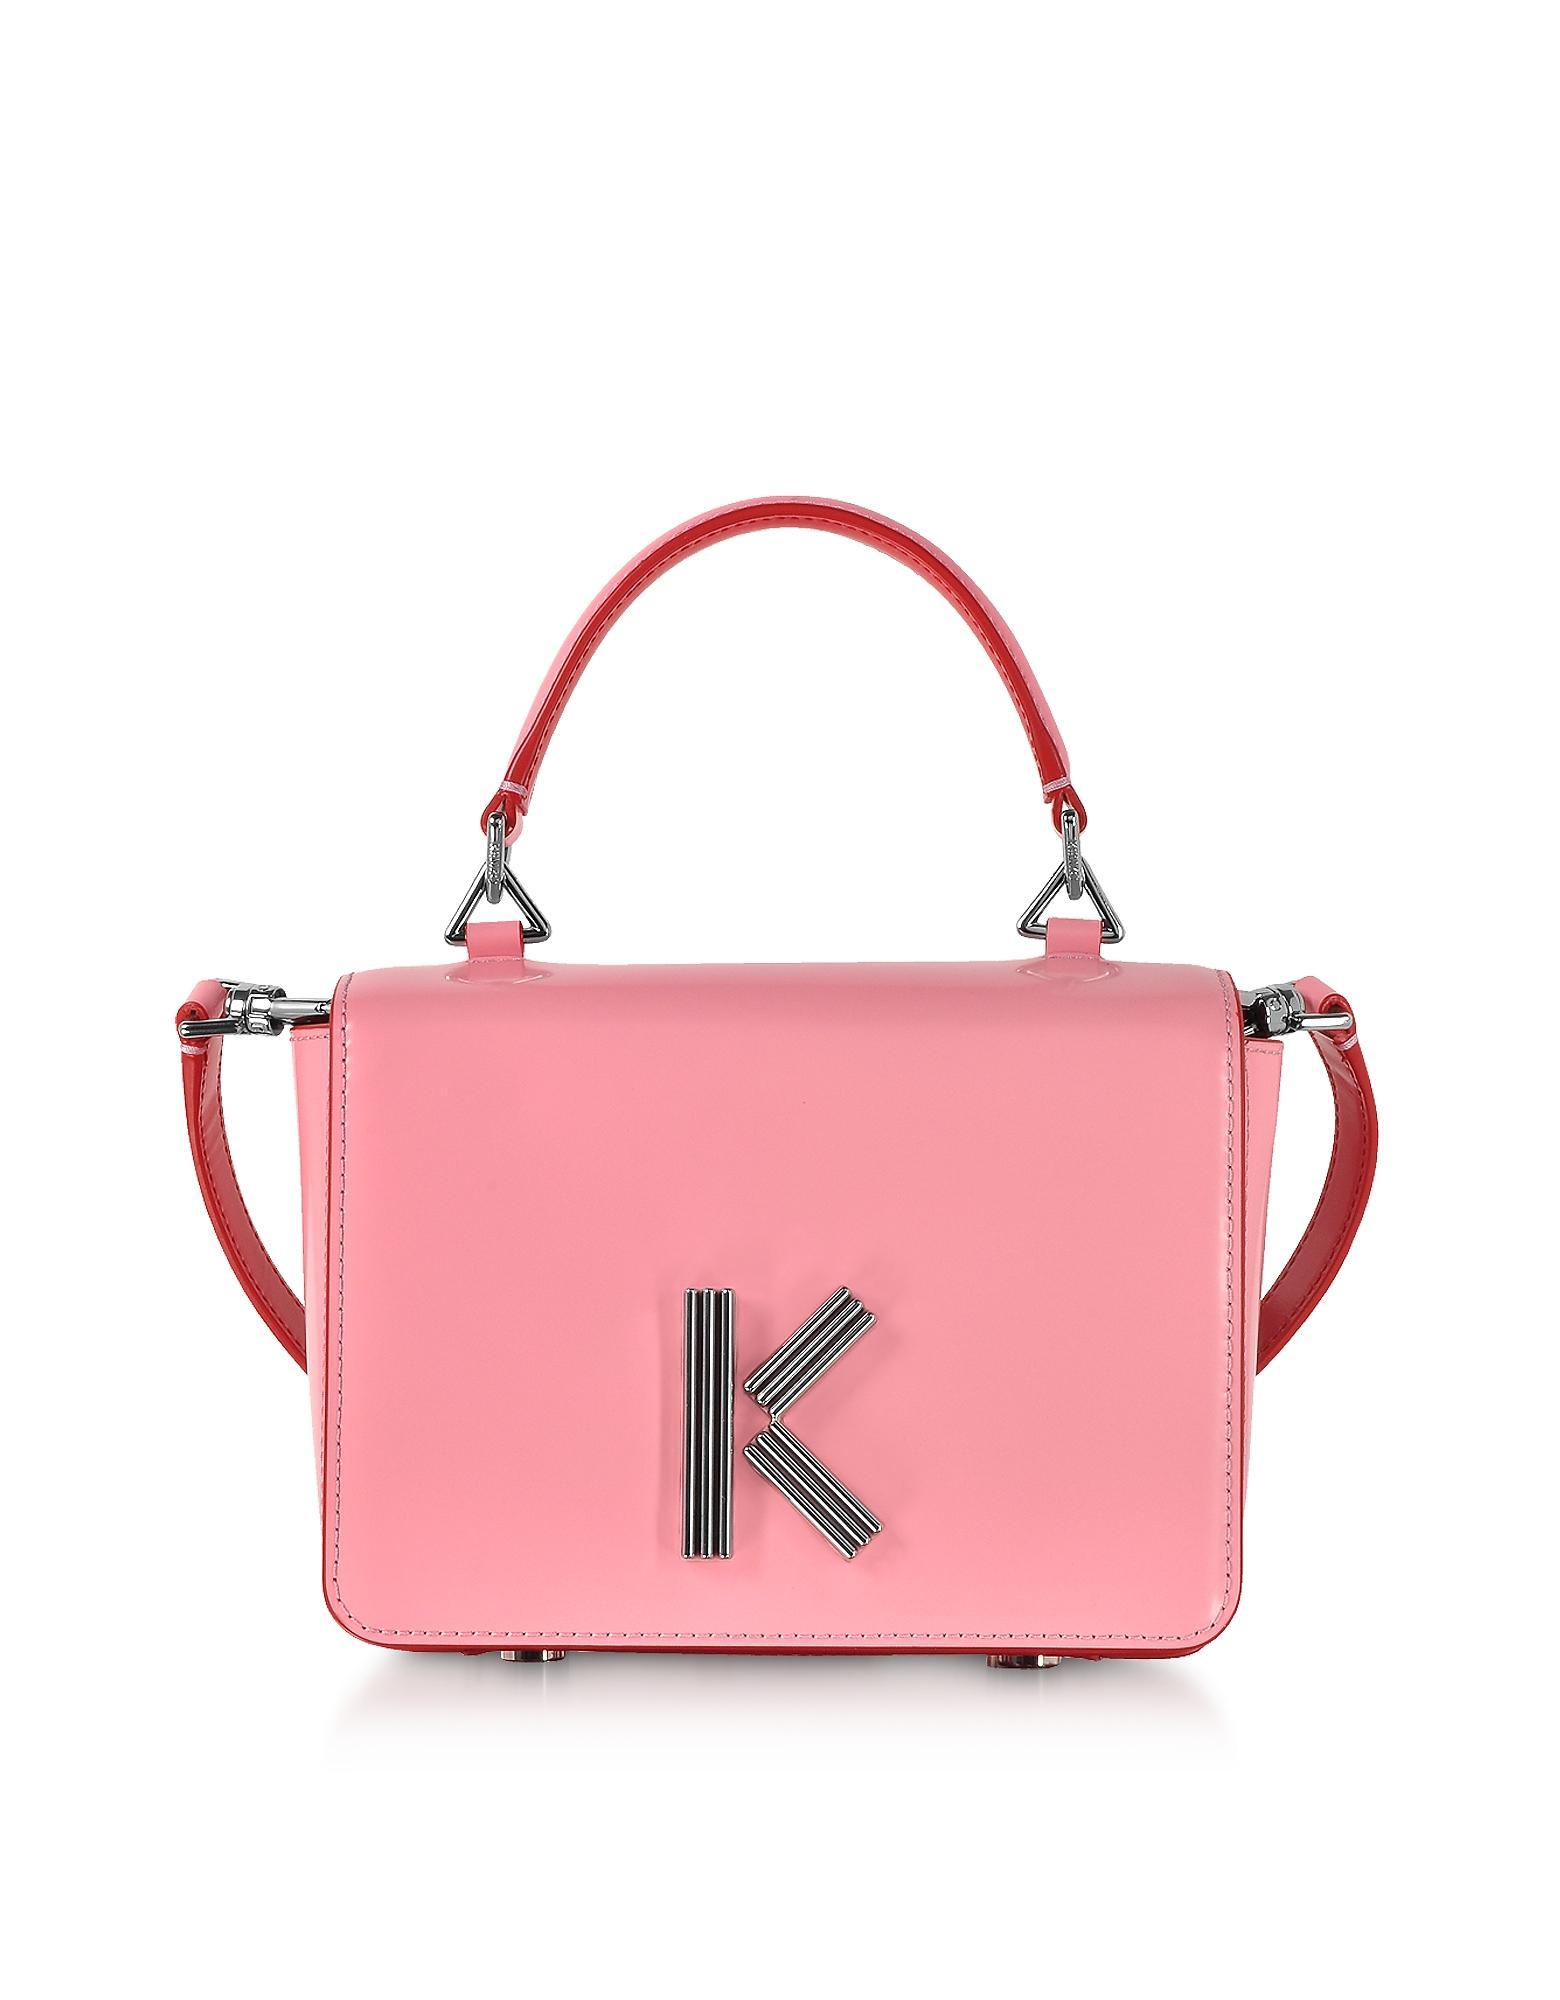 504d316ea18c Lyst - KENZO Medium Faded Pink Leather Crossbody K-bag in Pink